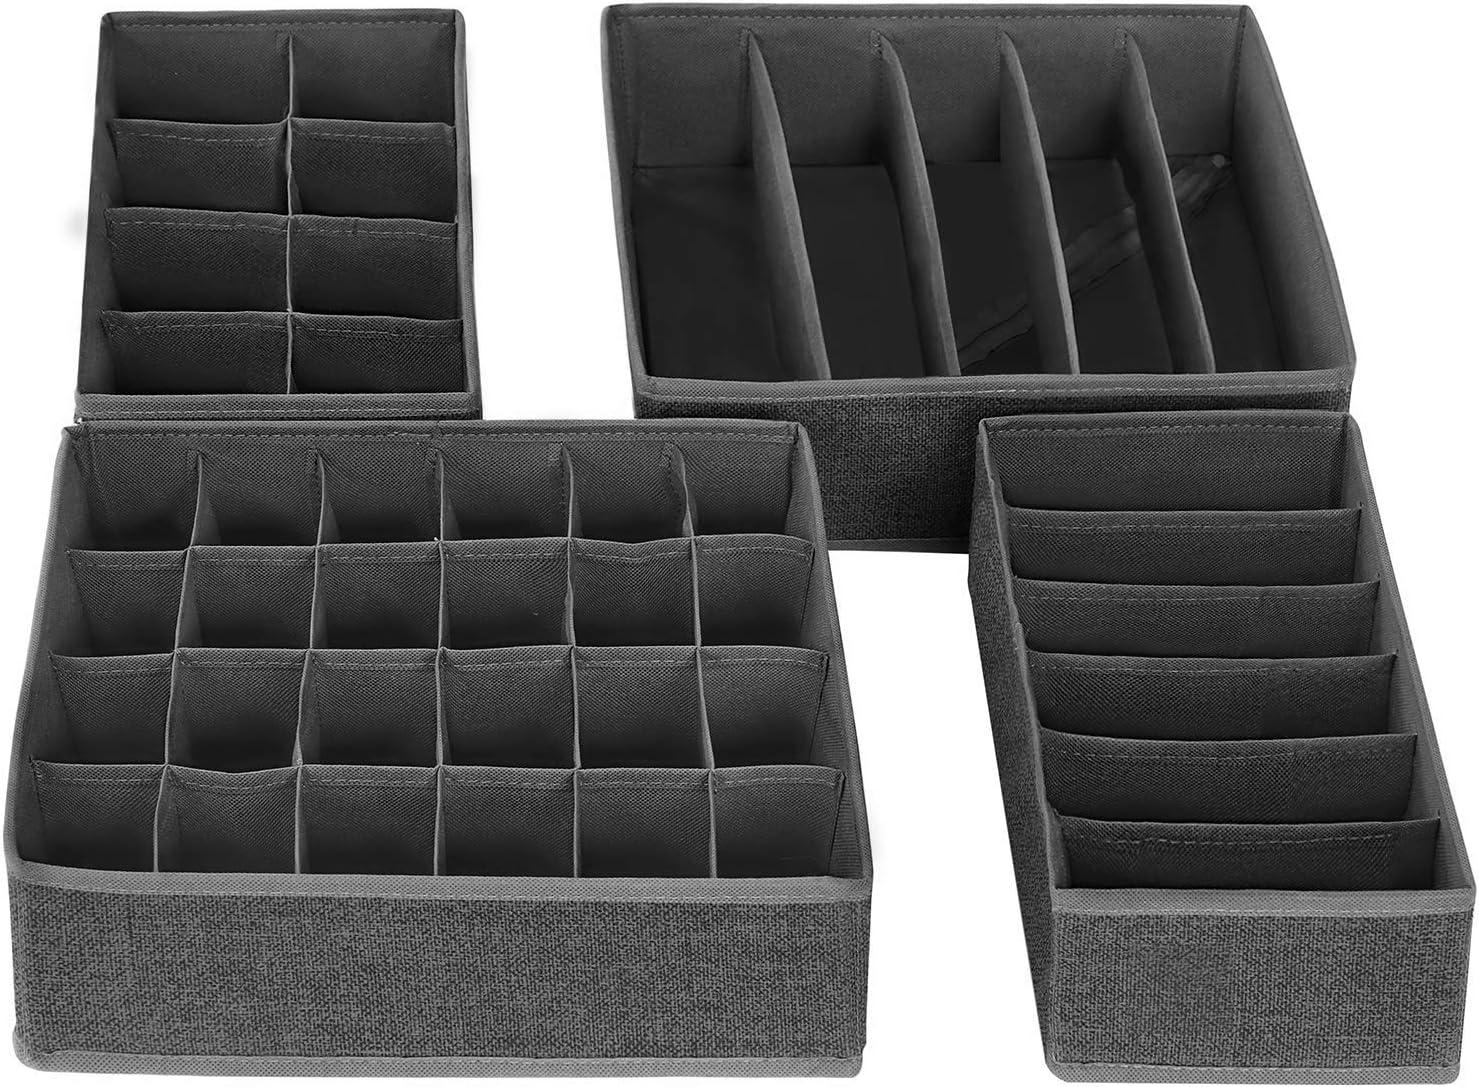 Gris Oscuro SONGMICS Organizador para Cajones con Compartimentos Caja de Almacenaje Plegable RYUS04W Organizador de Armario para Ropa Interior Set de 4 Piezas Calcetines